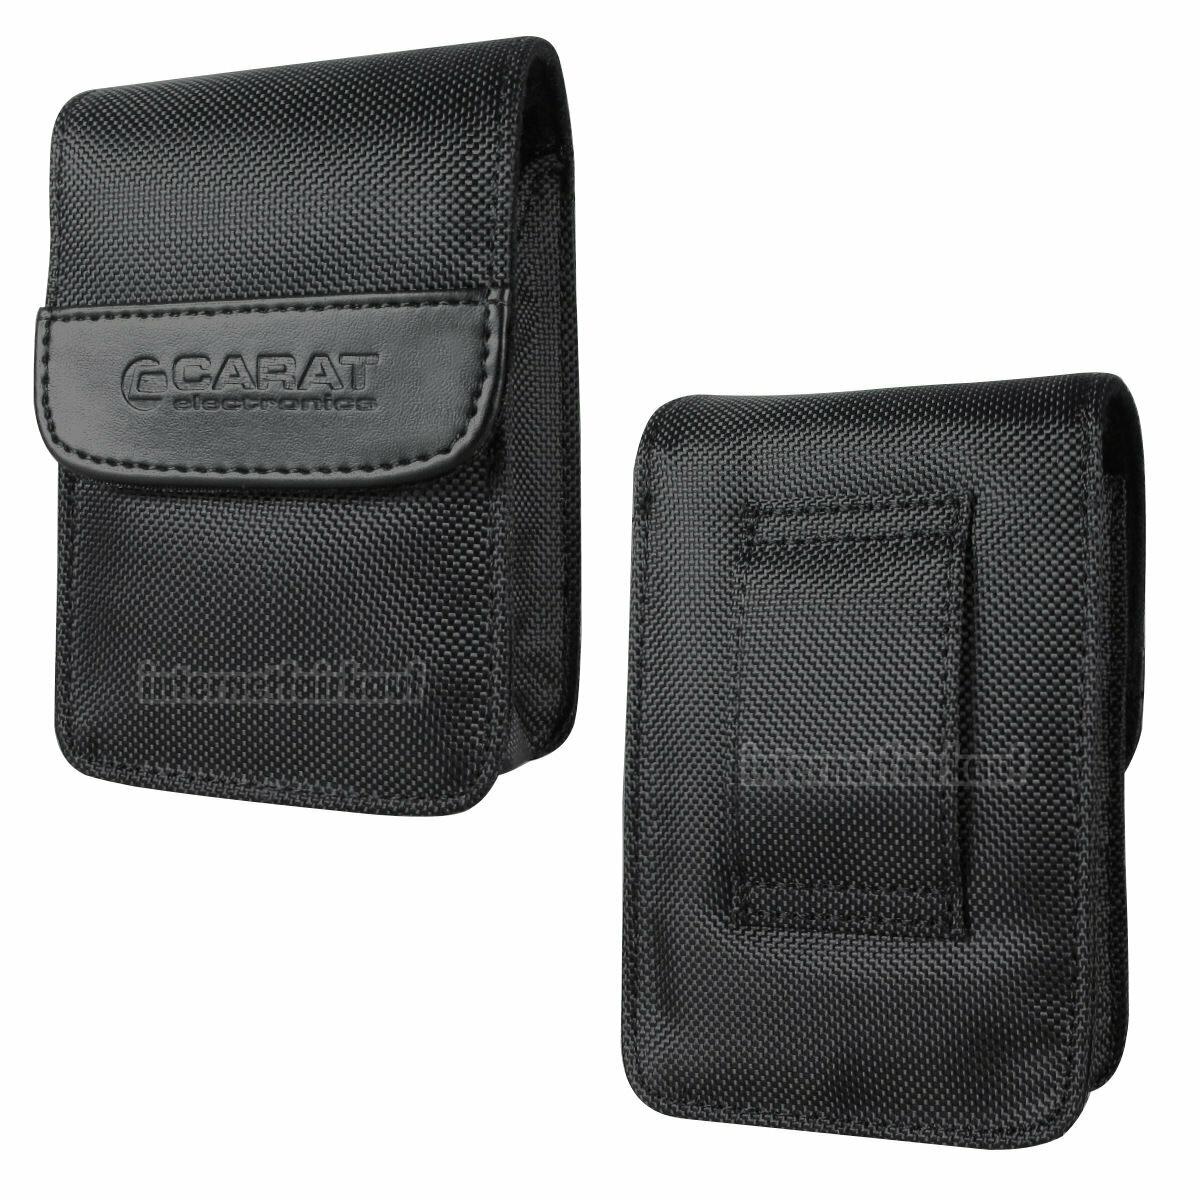 Tasche passend für Panasonic Lumix DMC-TZ6 TZ7 TZ8 TZ10 - Etui